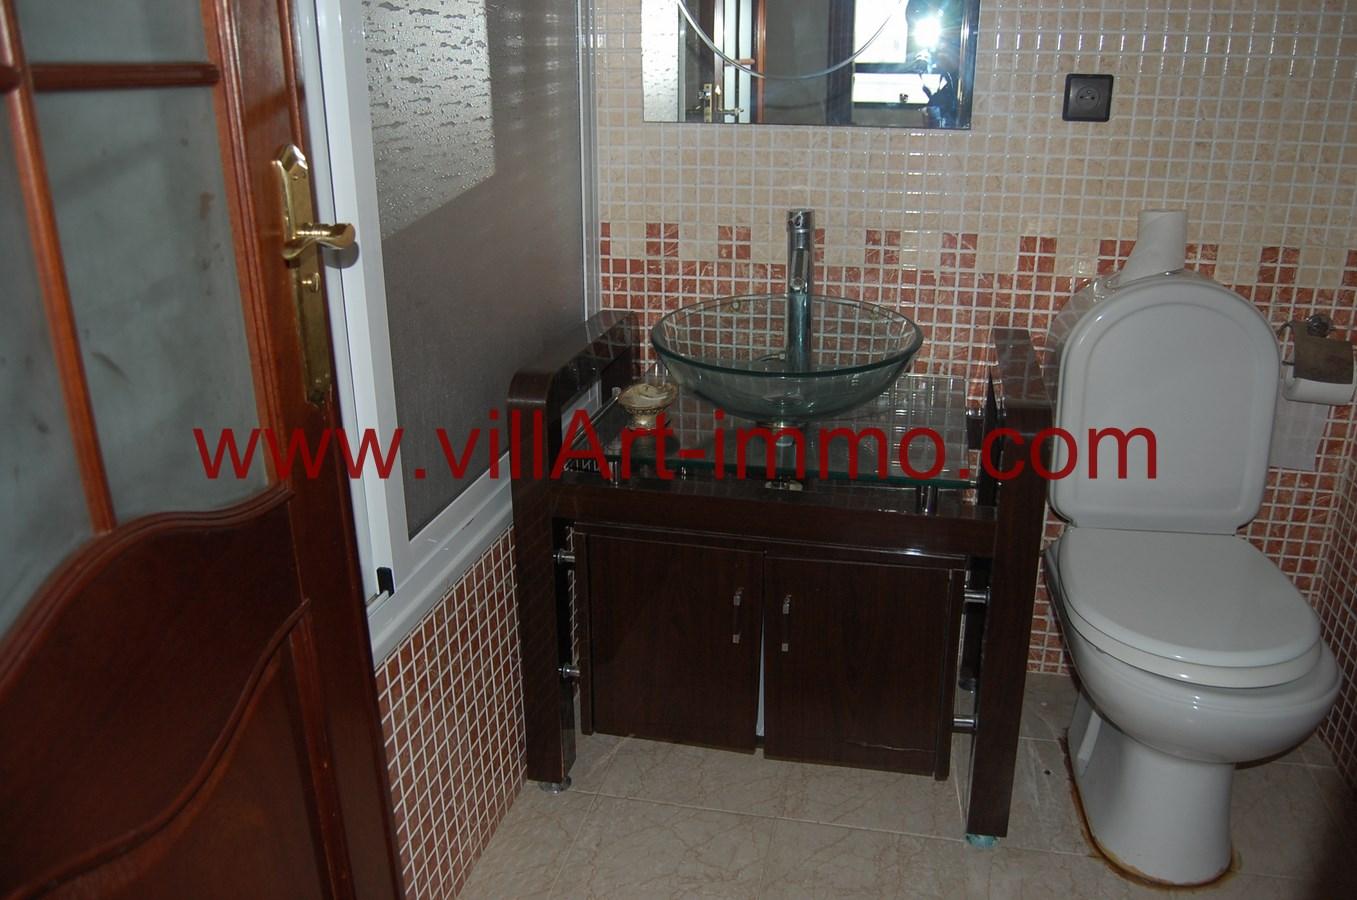 6-a-louer-appartement-non-meuble-tanger-salle-de-bain-1-l891-villart-immo